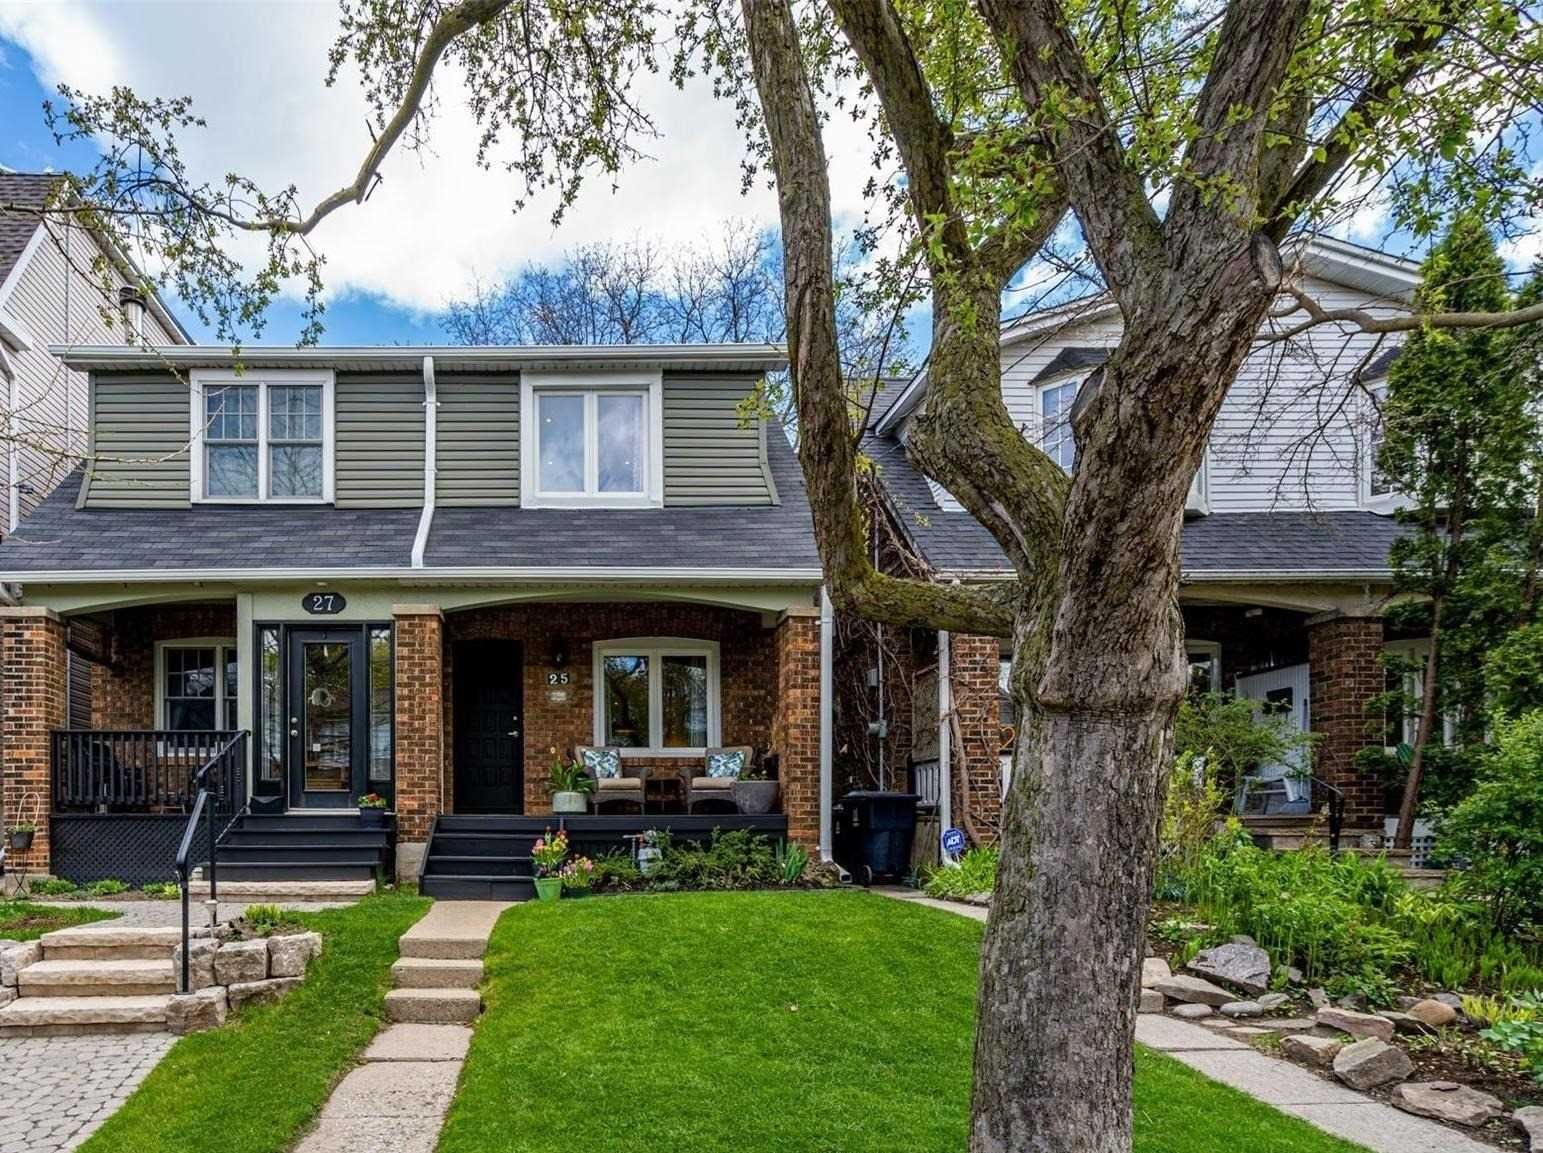 Main Photo: 25 Osborne Avenue in Toronto: East End-Danforth House (2-Storey) for sale (Toronto E02)  : MLS®# E5232546